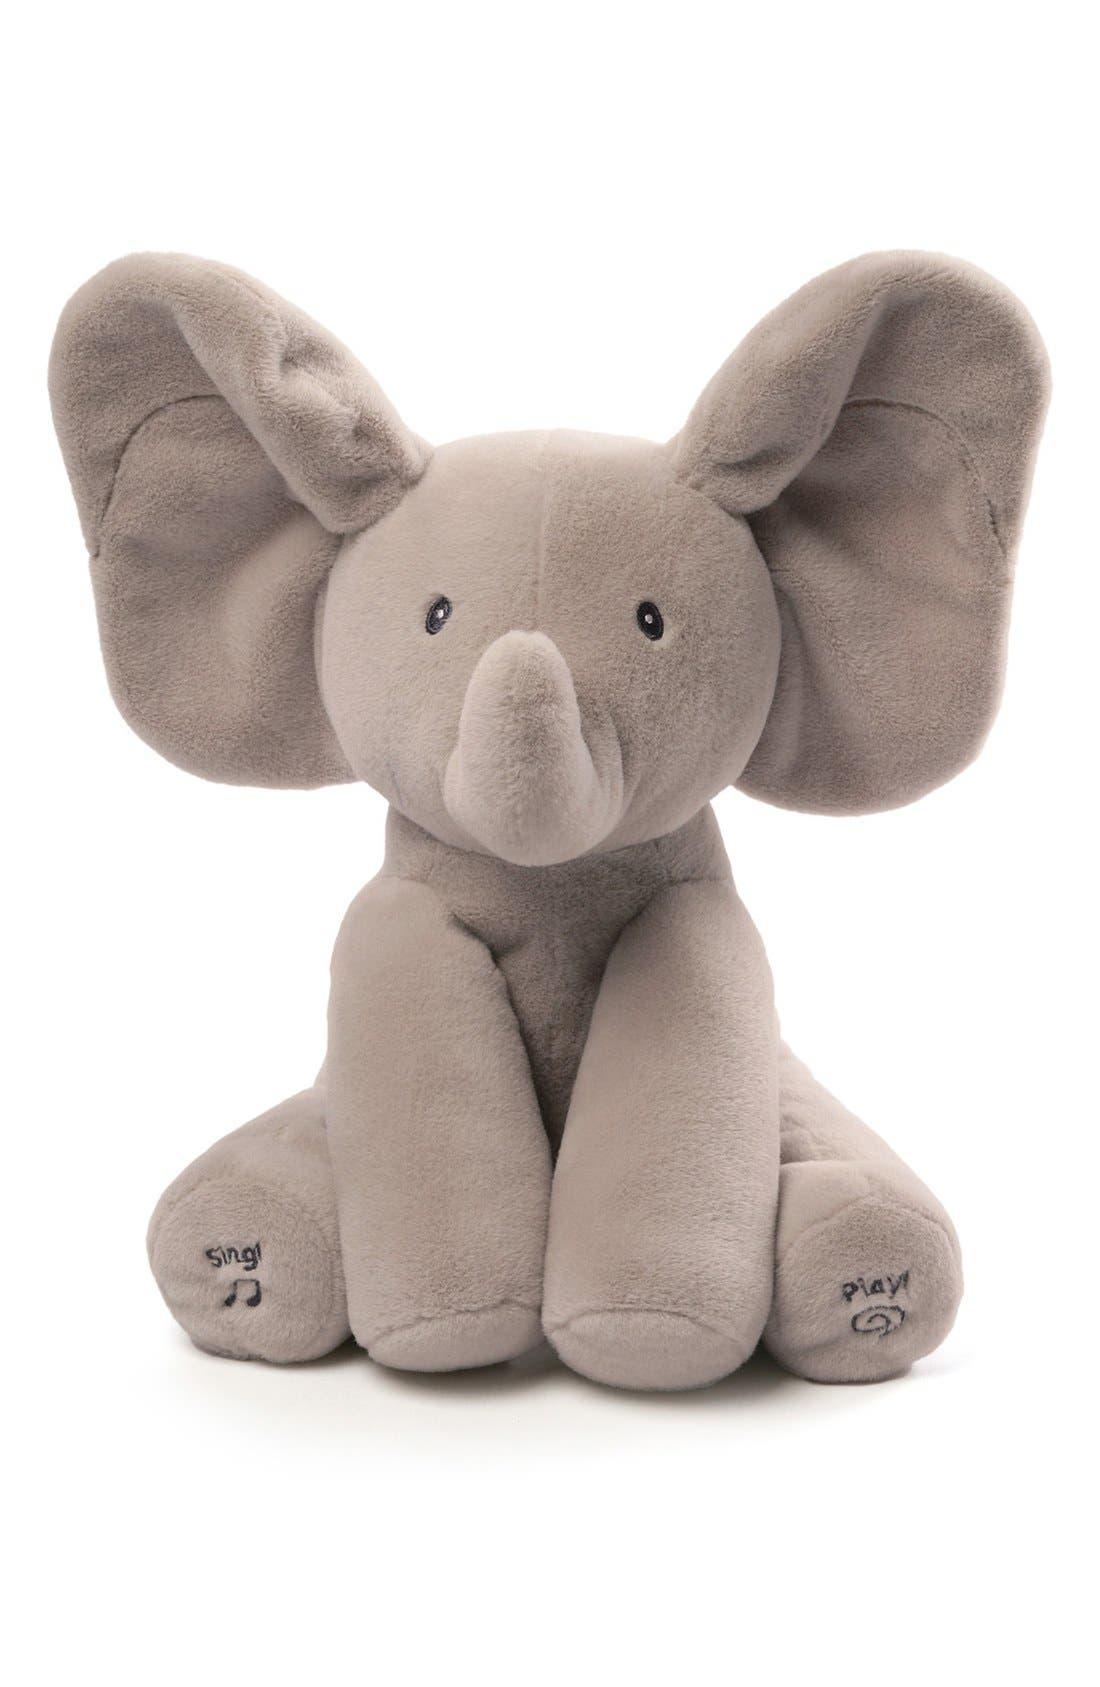 Baby Gund 'Flappy The Elephant' Musical Elephant